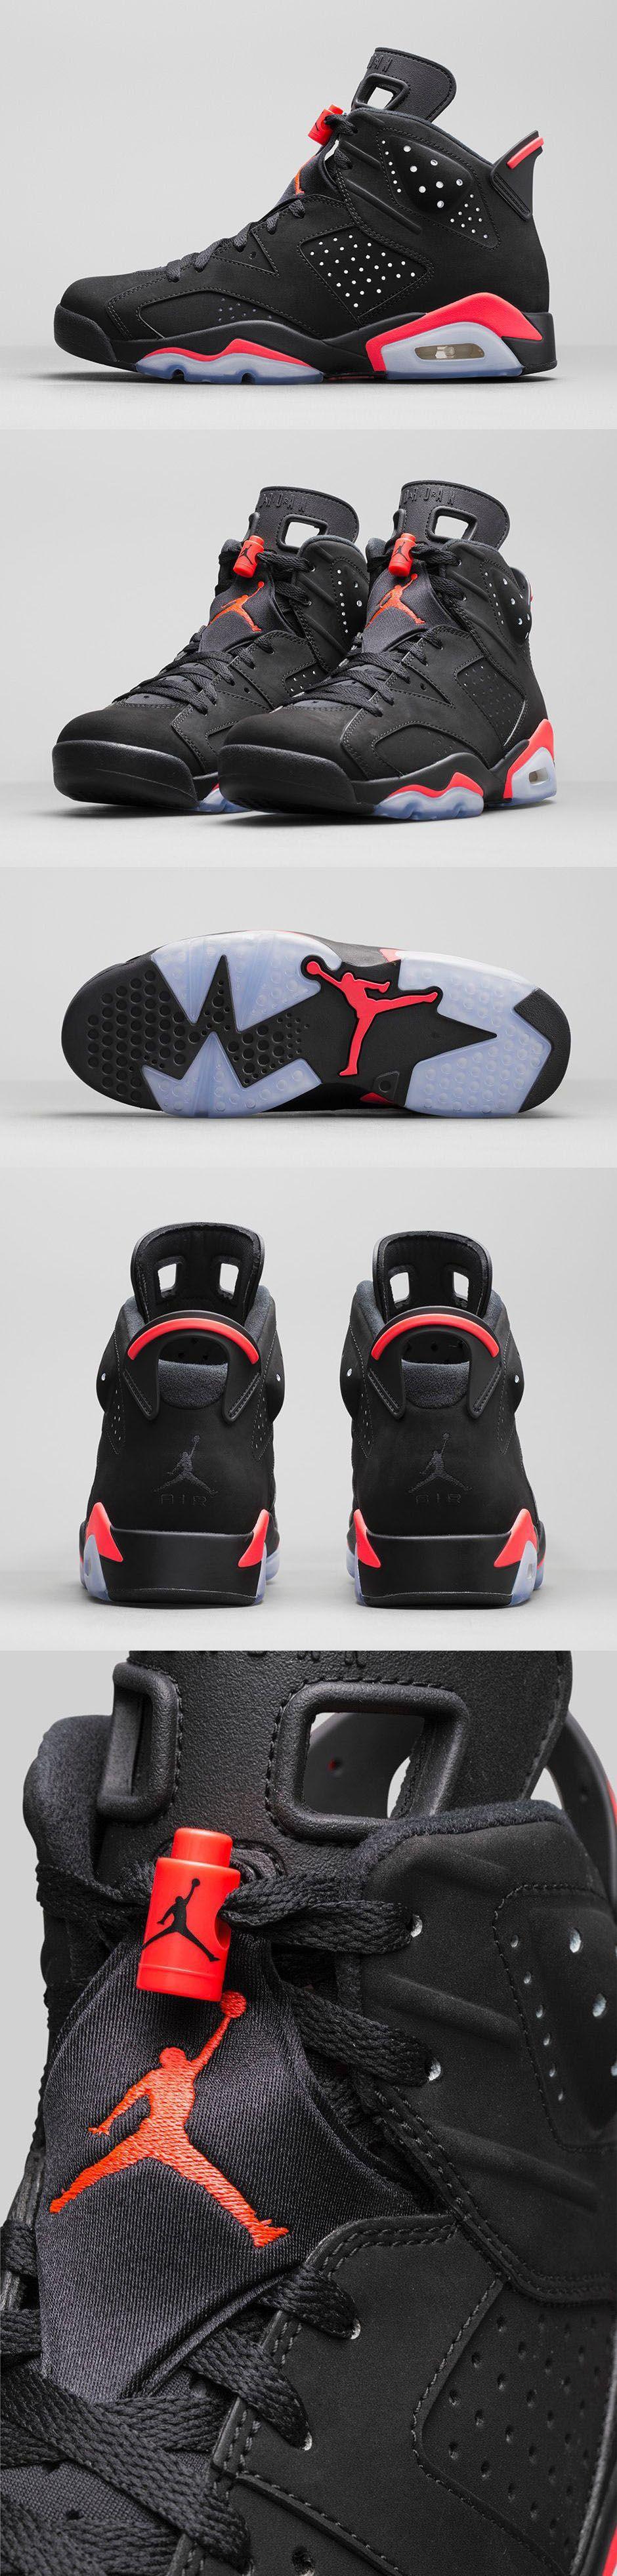 Soletopia Run Roshe Blackblack Air Flyknit Jordan Nm Nike agq4Xx